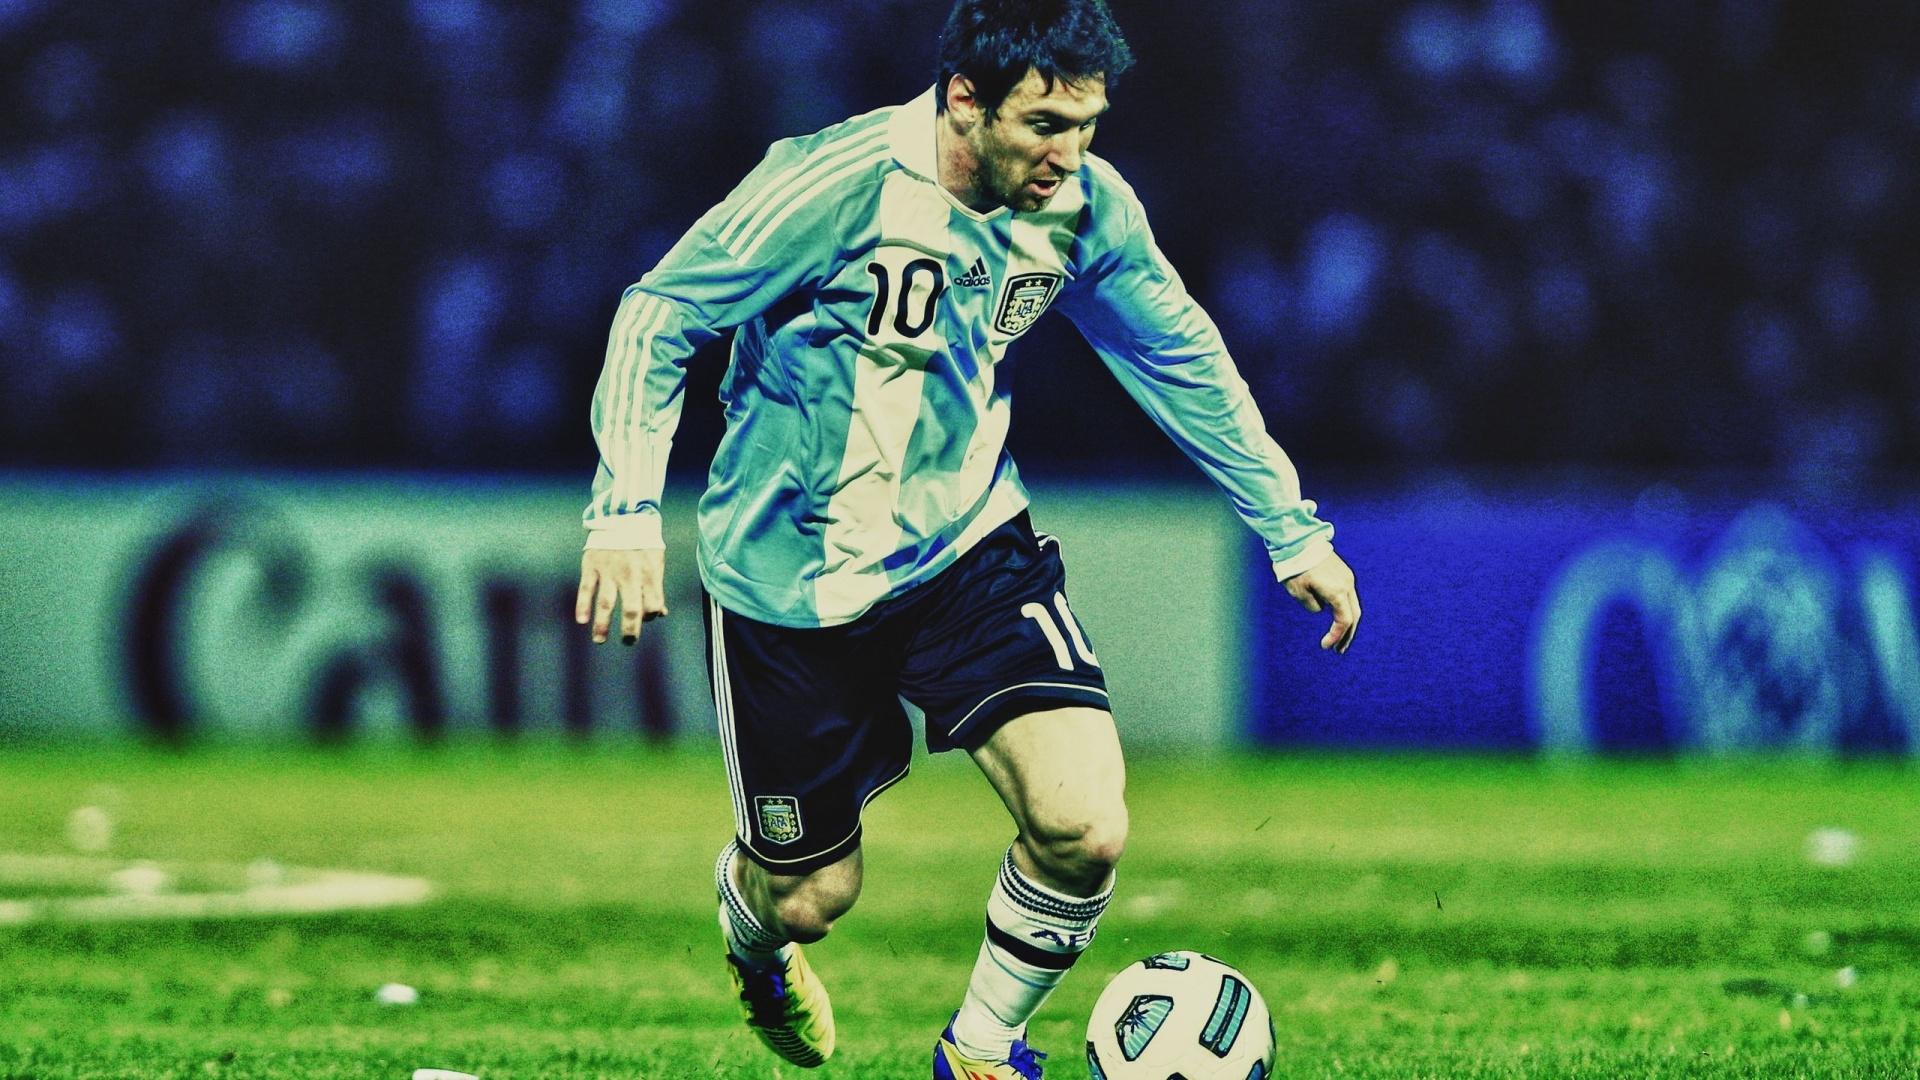 Messi 3d Wallpaper 2017 Hd Argentina Soccer Wallpaper Pixelstalk Net